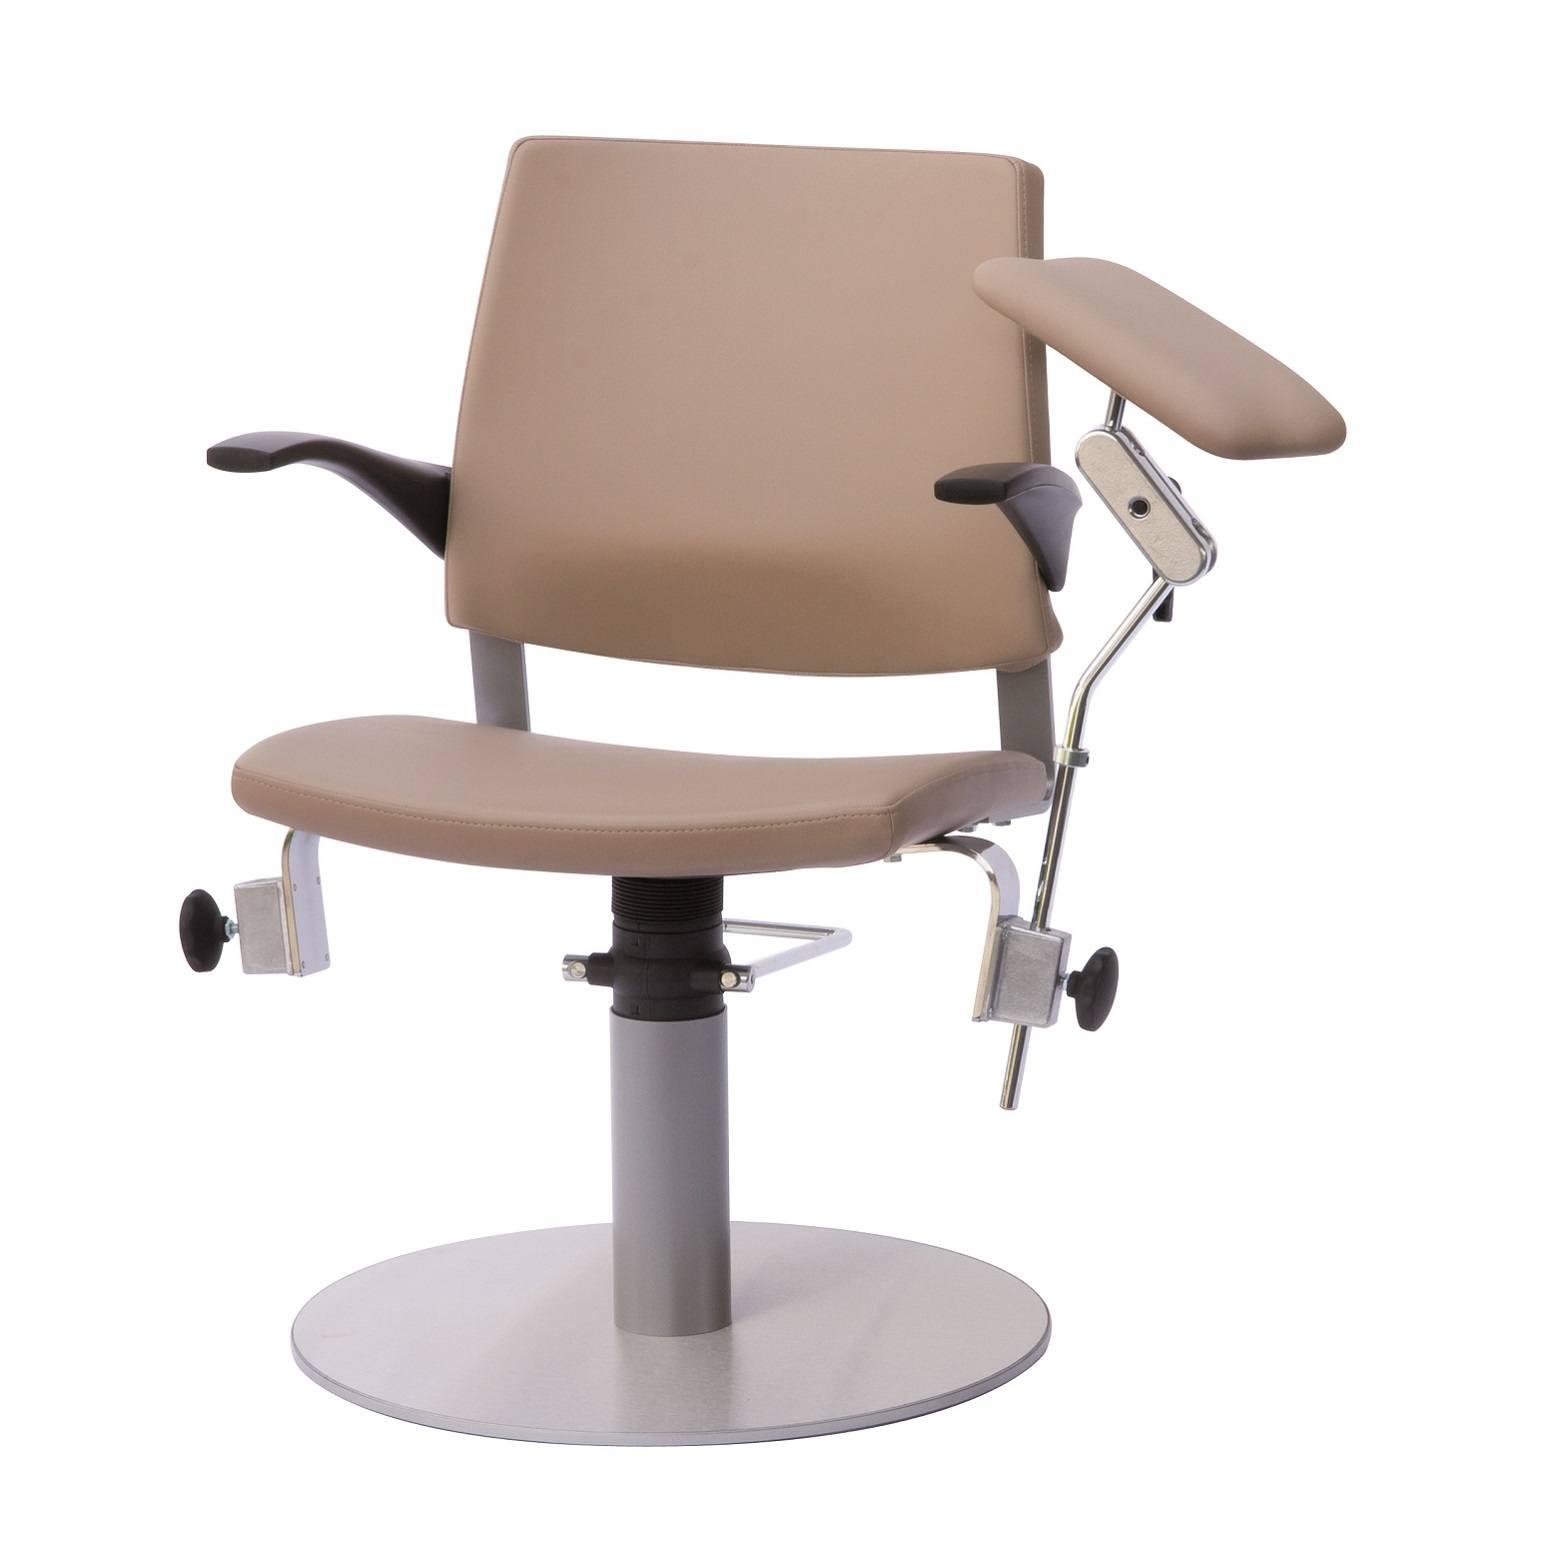 prøvetagningsstole til hospitaler